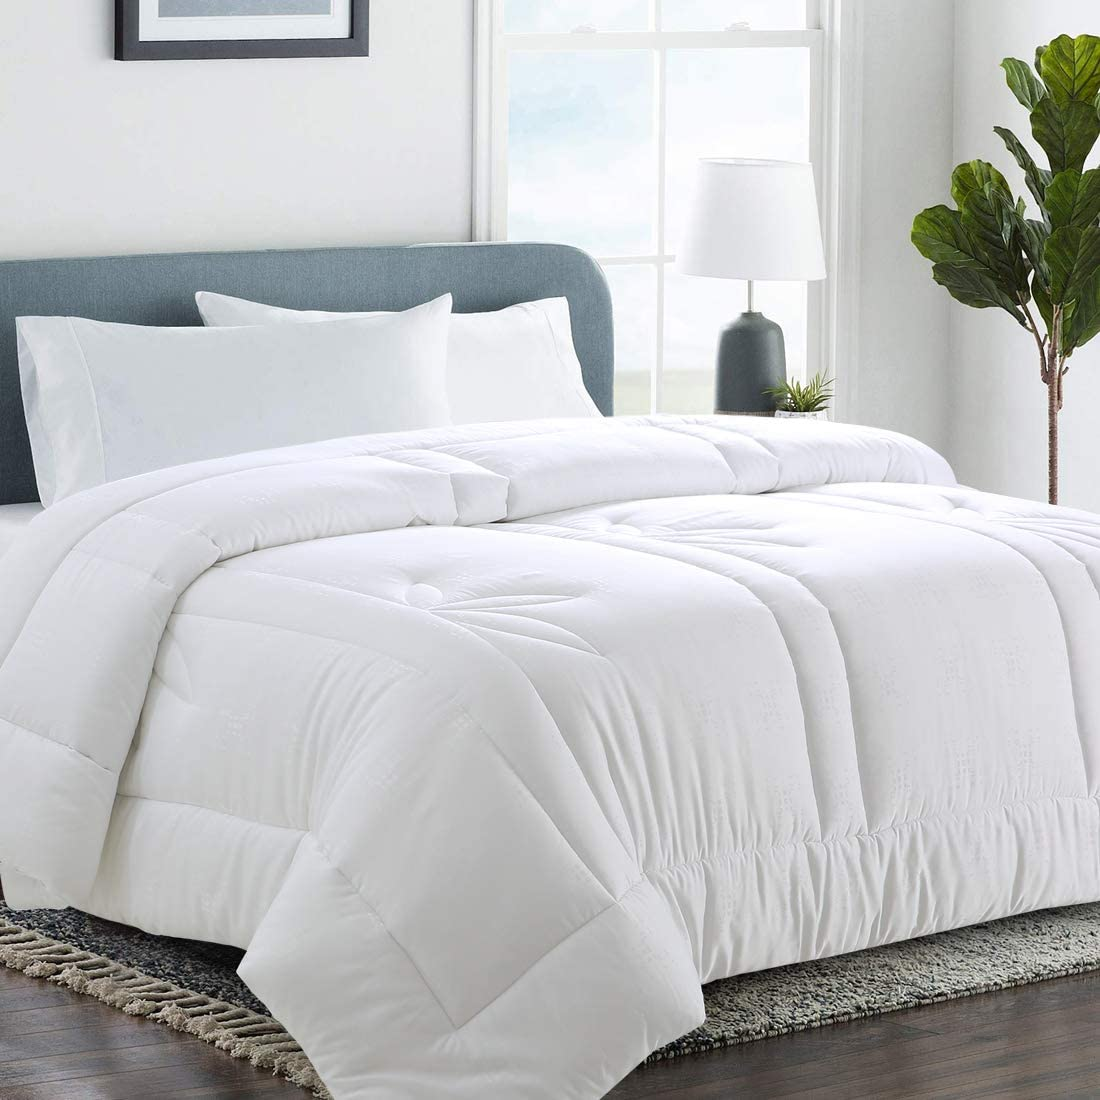 COHOME Queen Bamboo Fiber Comforter Duvet Insert Corner Ties,Fluffy Lightweight Cooling All Season Soft Reversible Hotel Collection (White Bamboo Fiber)